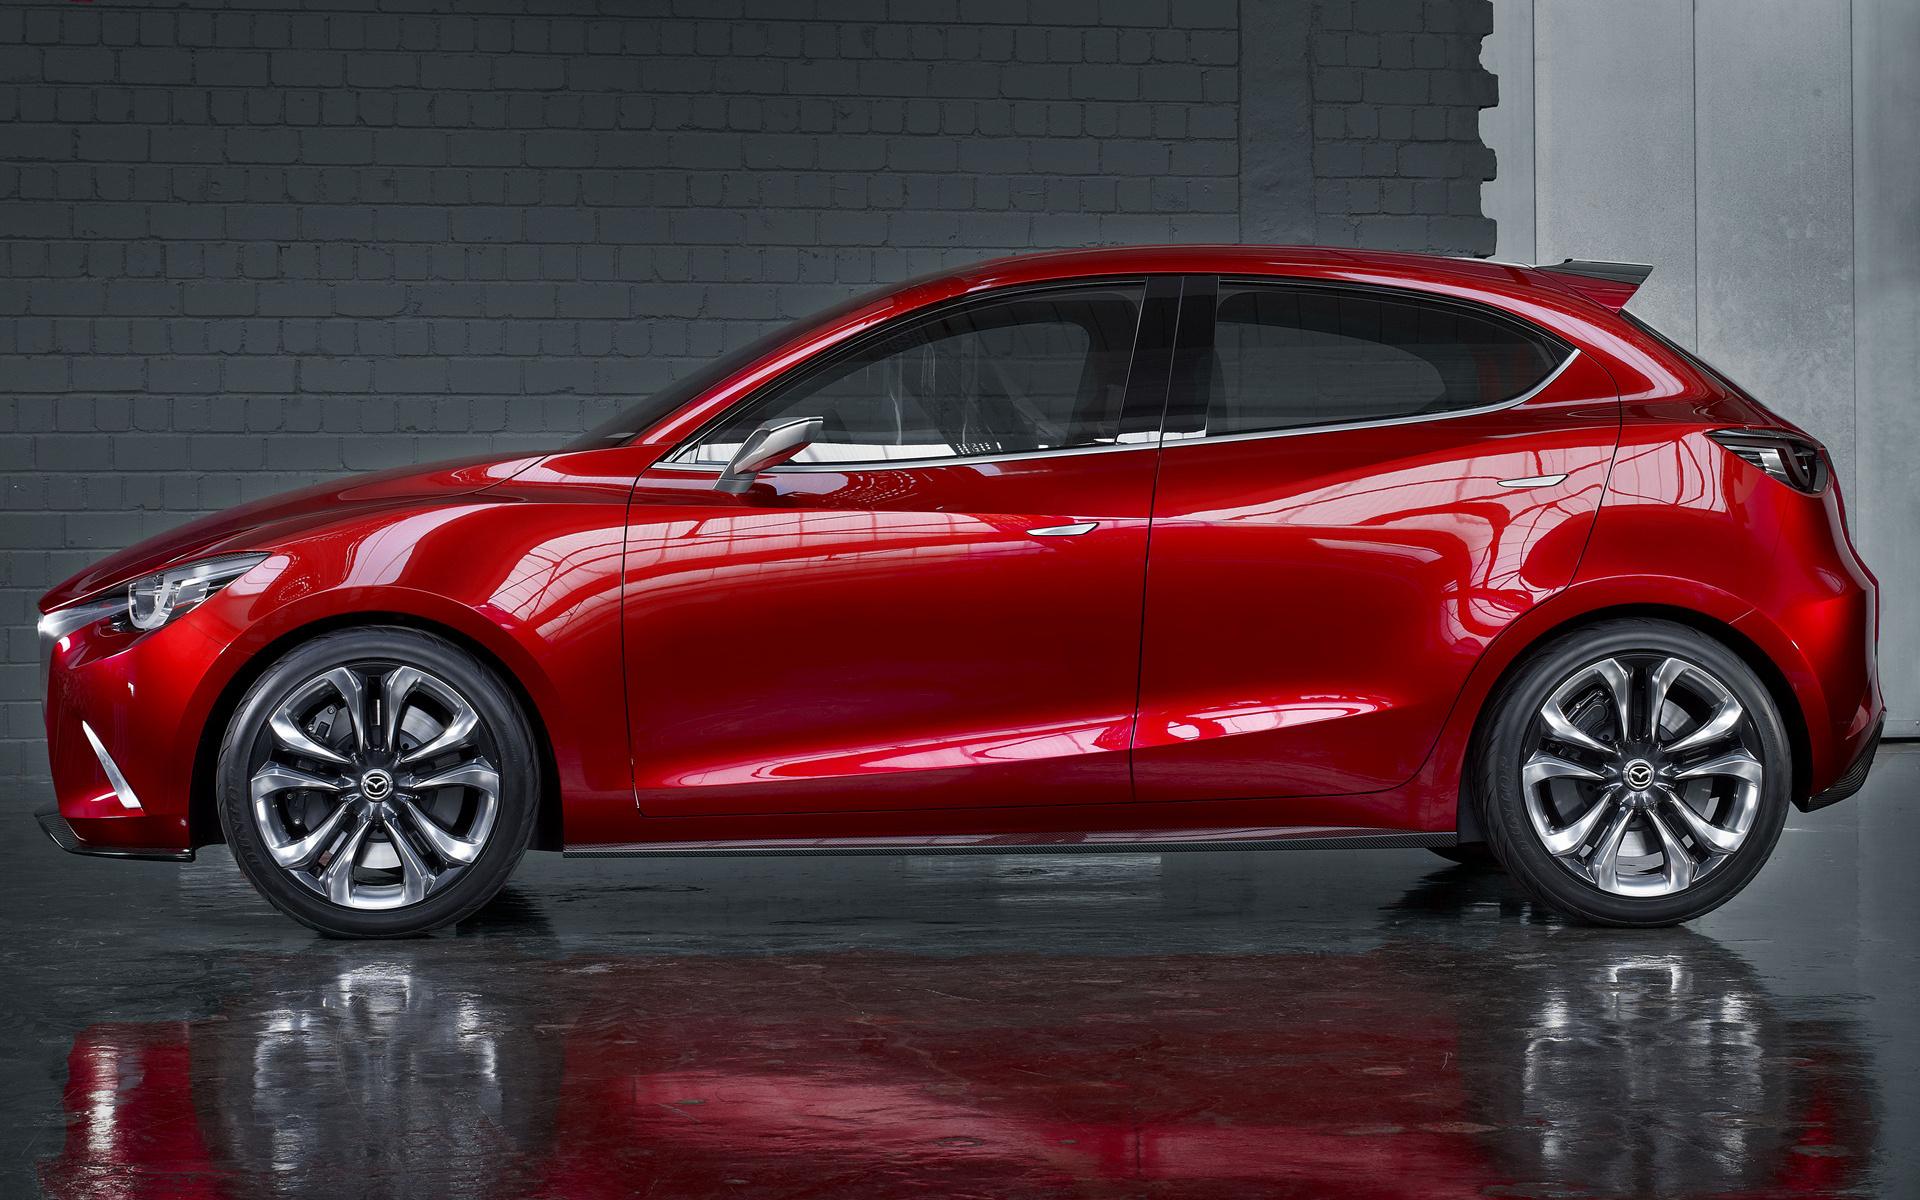 Mazda Hazumi Concept (2014) Wallpapers and HD Images - Car Pixel